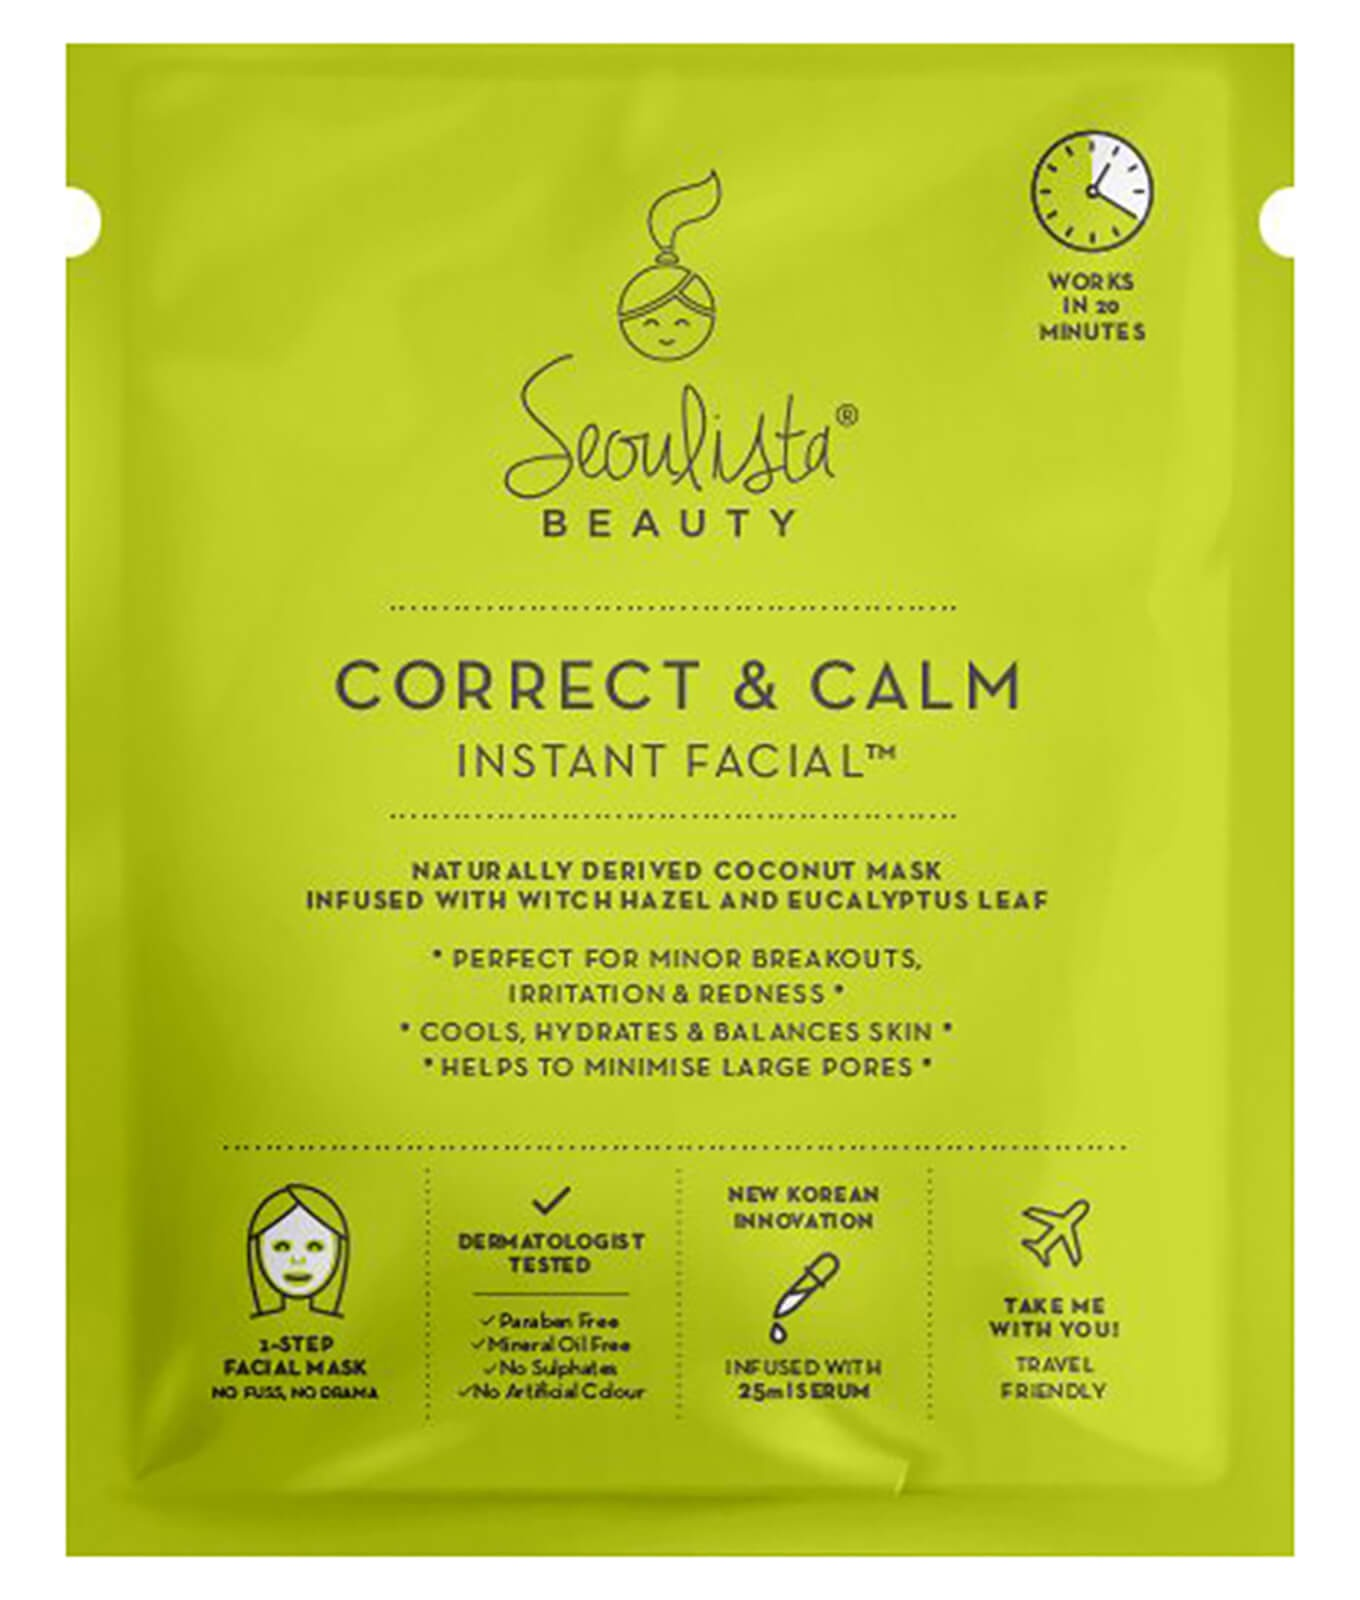 Seoulista Beauty Correct And Calm Instant Facial